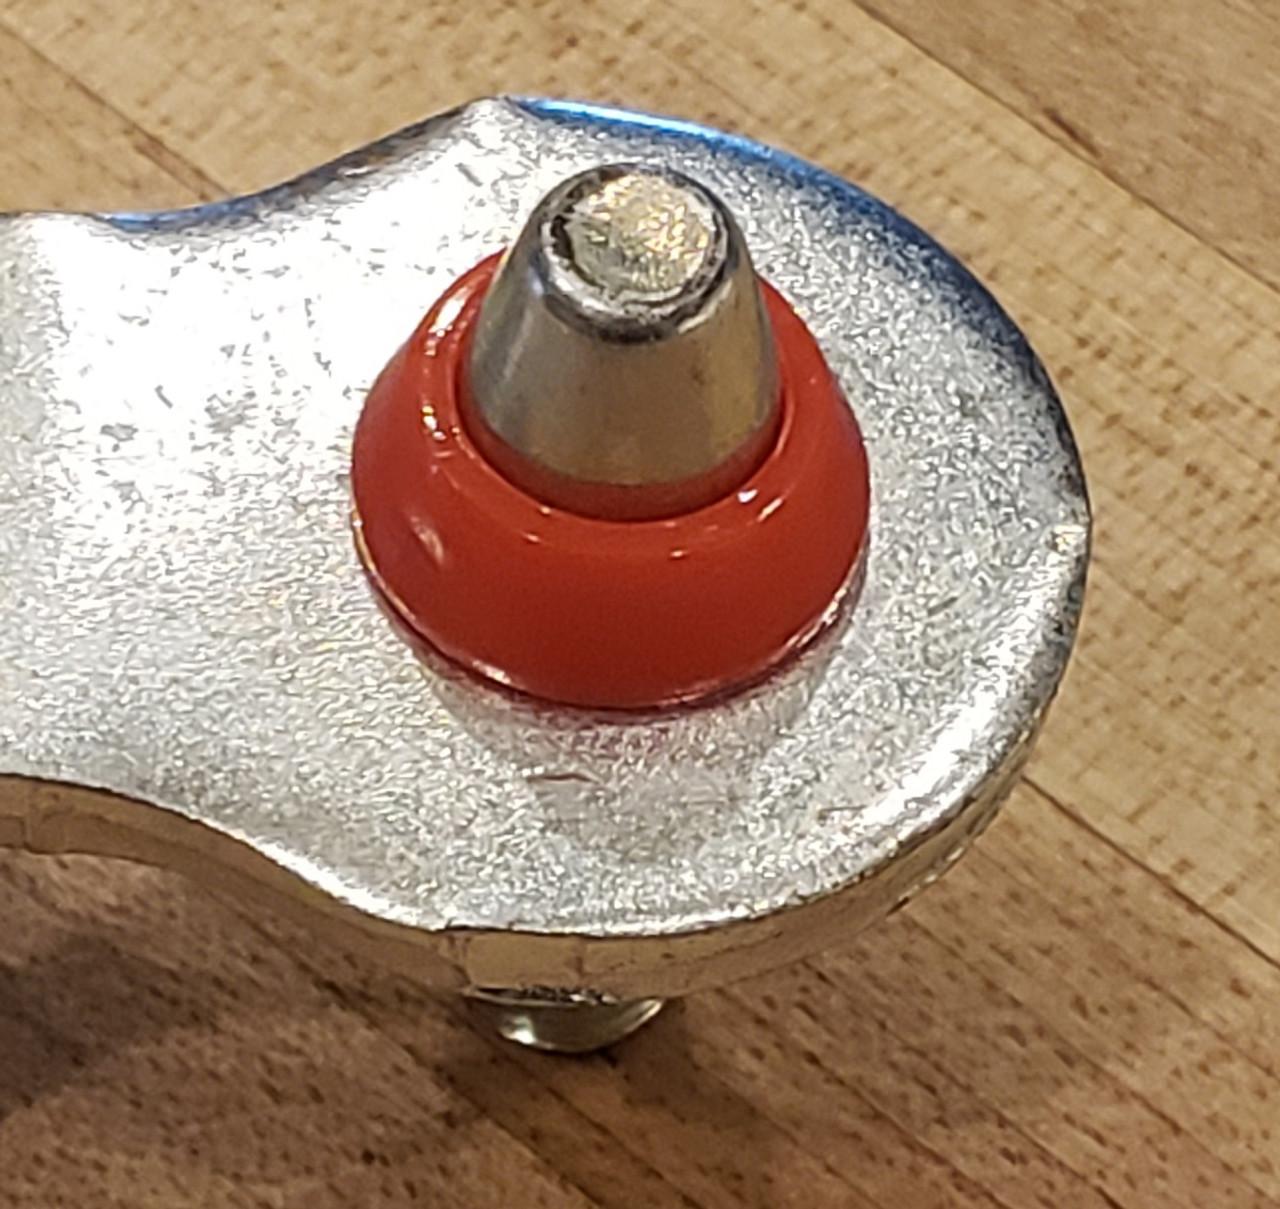 Mercury Sable FA1KIT™ Transmission Shift Lever / Linkage Replacement Bushing Kit fits onto pin as shown.